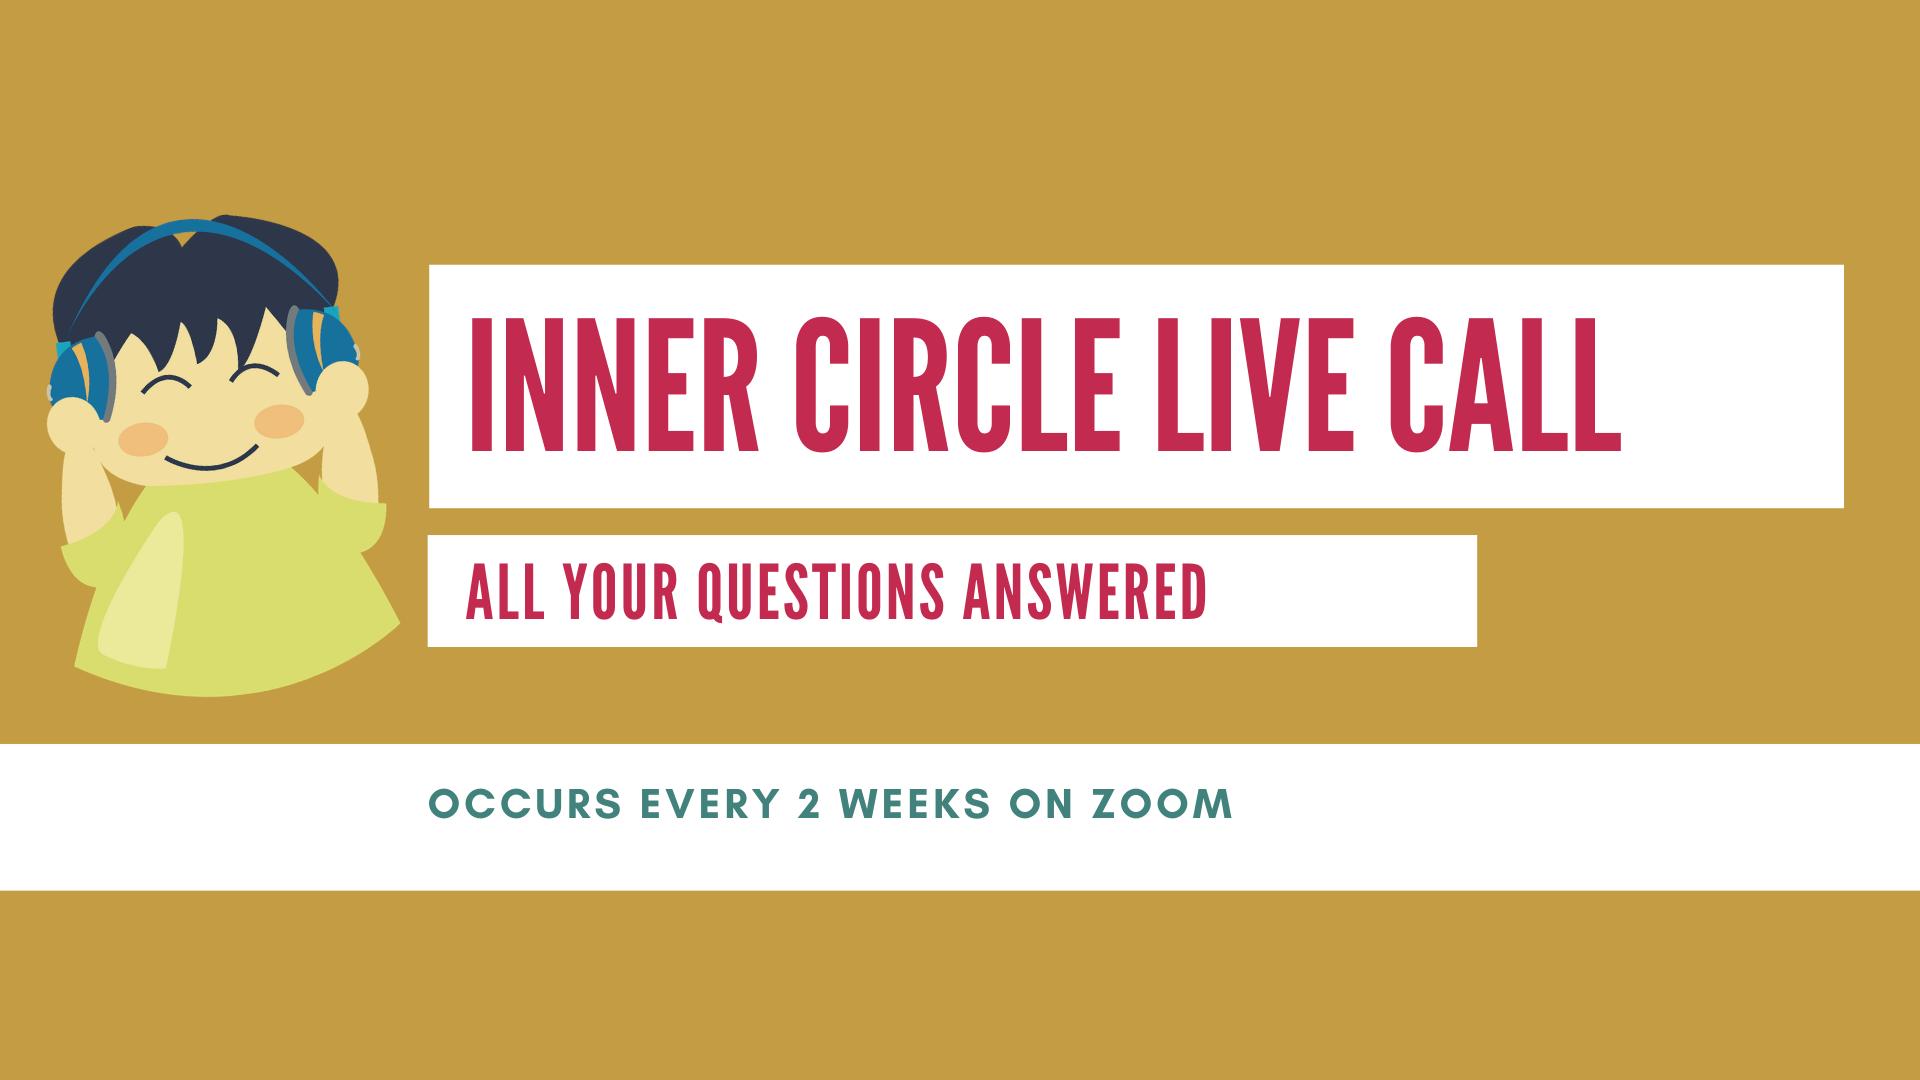 Inner Circle Live Call